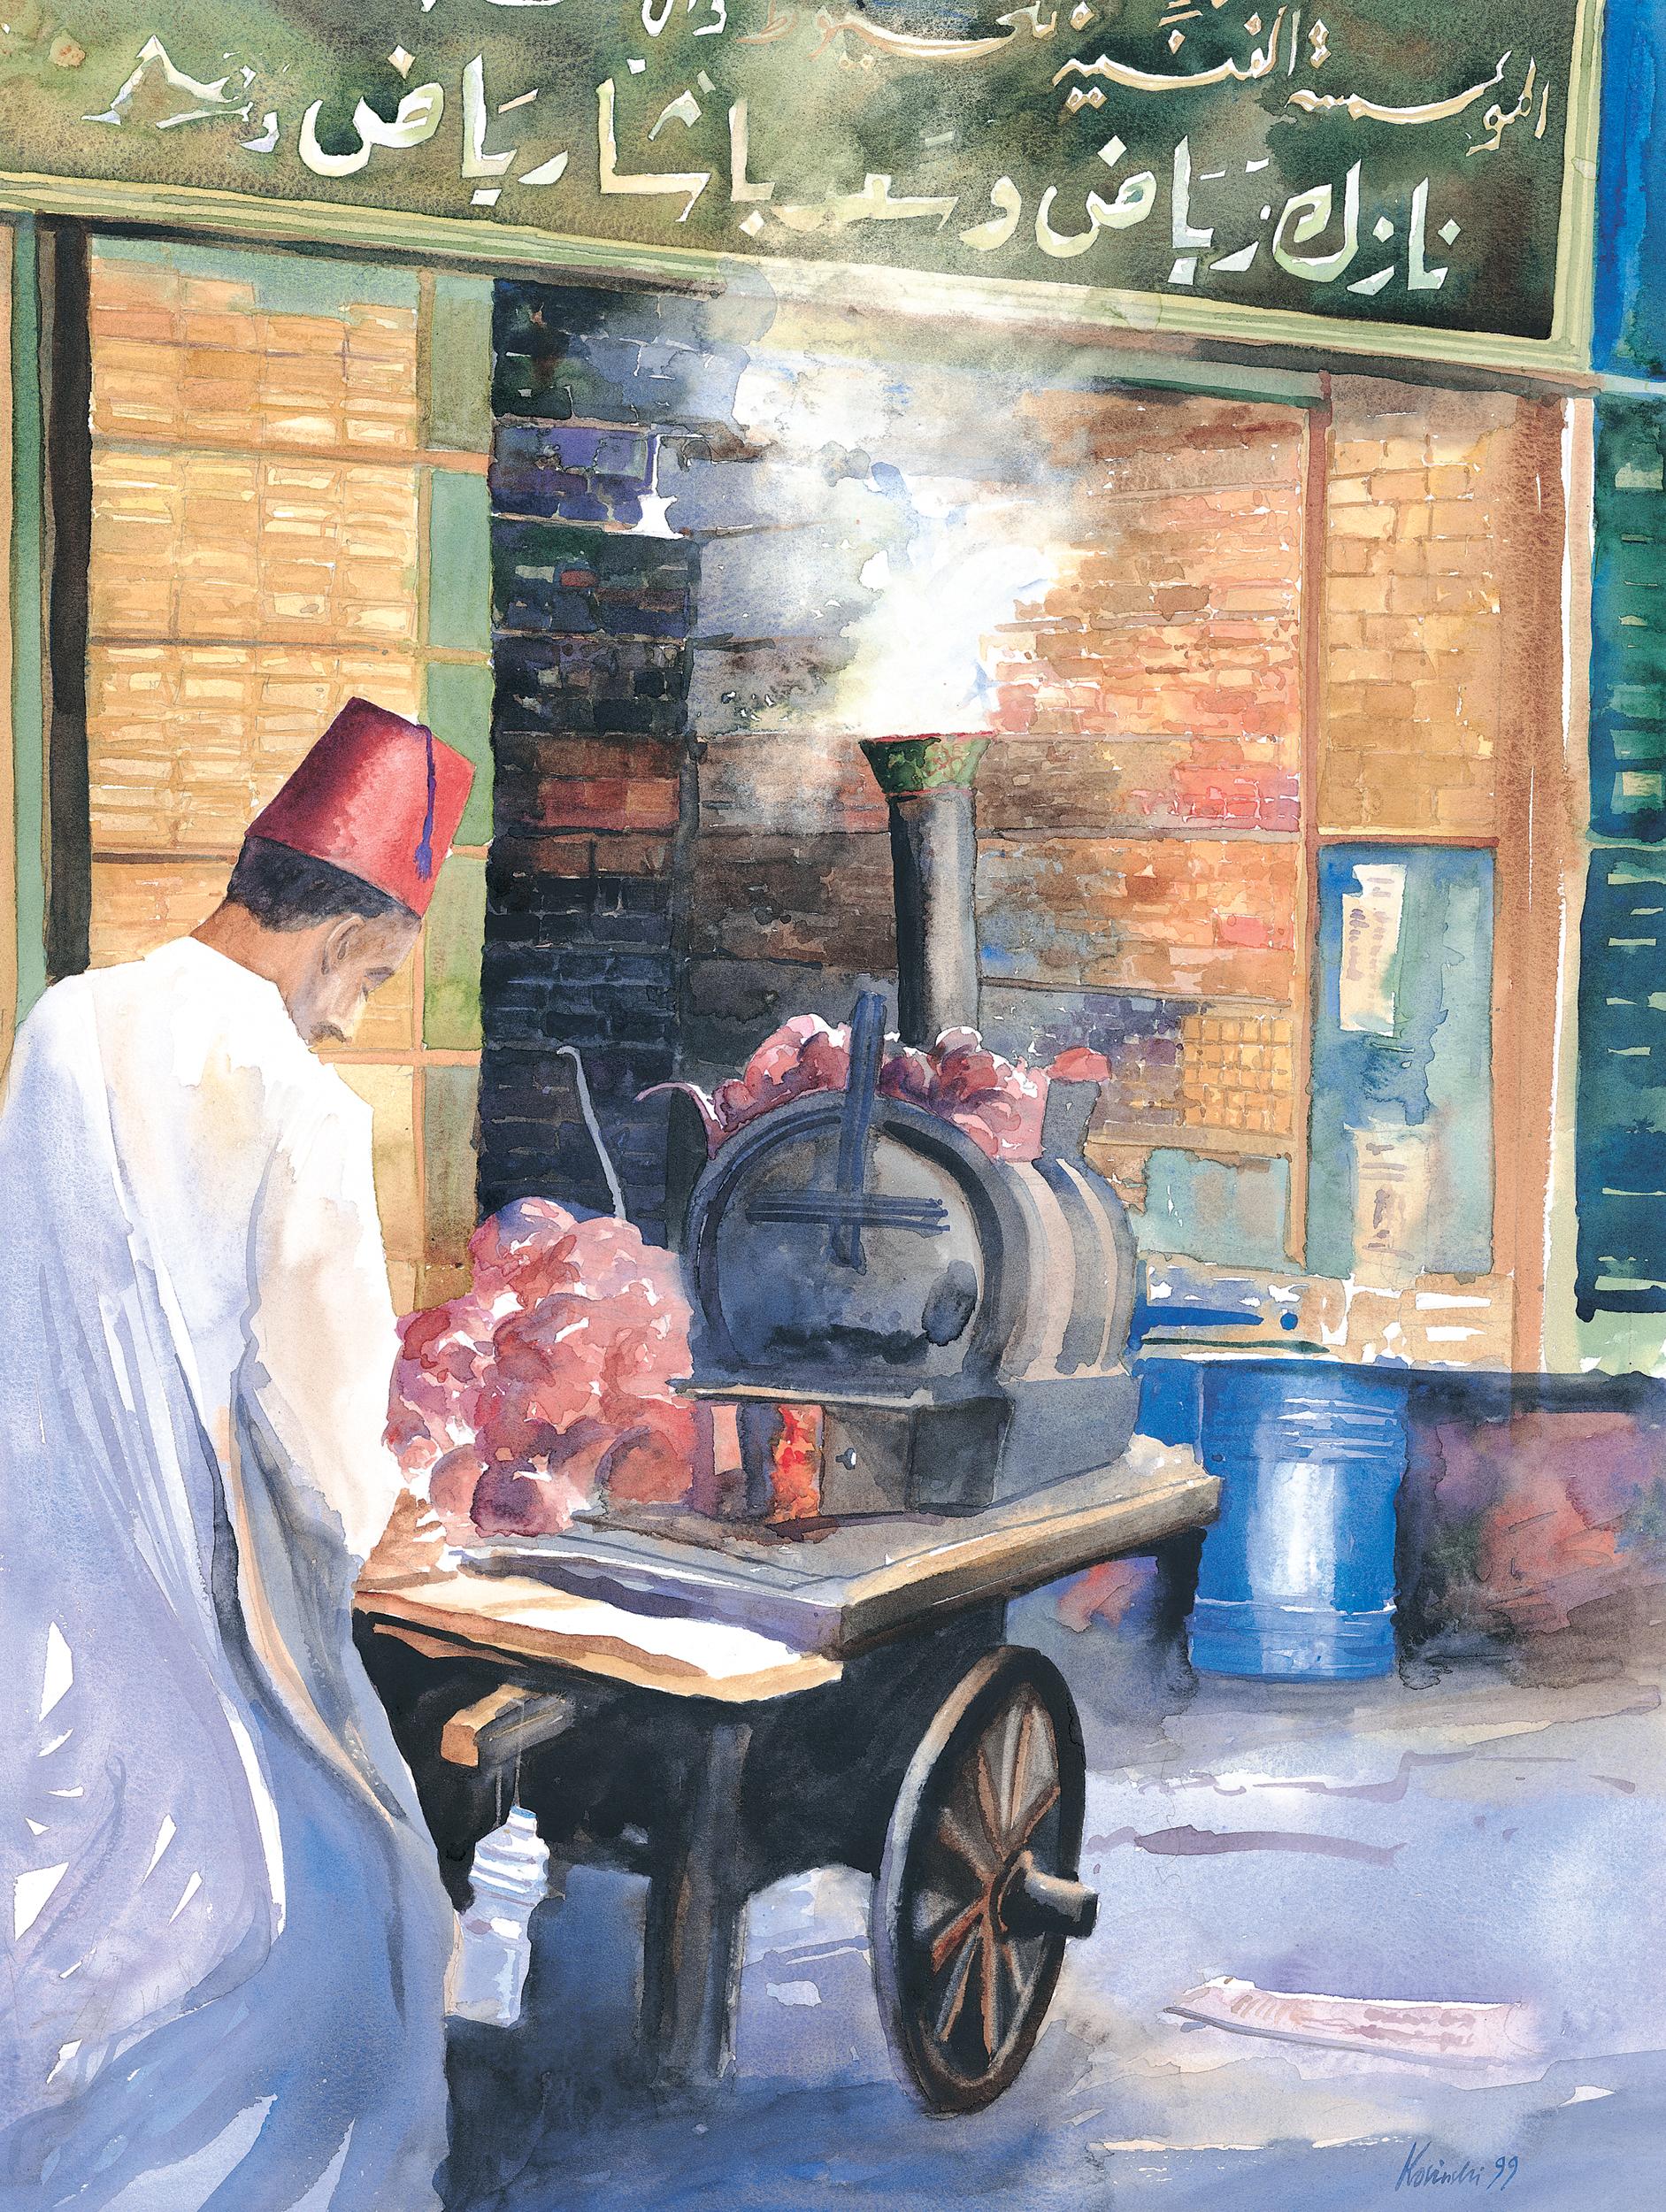 Baked Potato Seller, Cairo